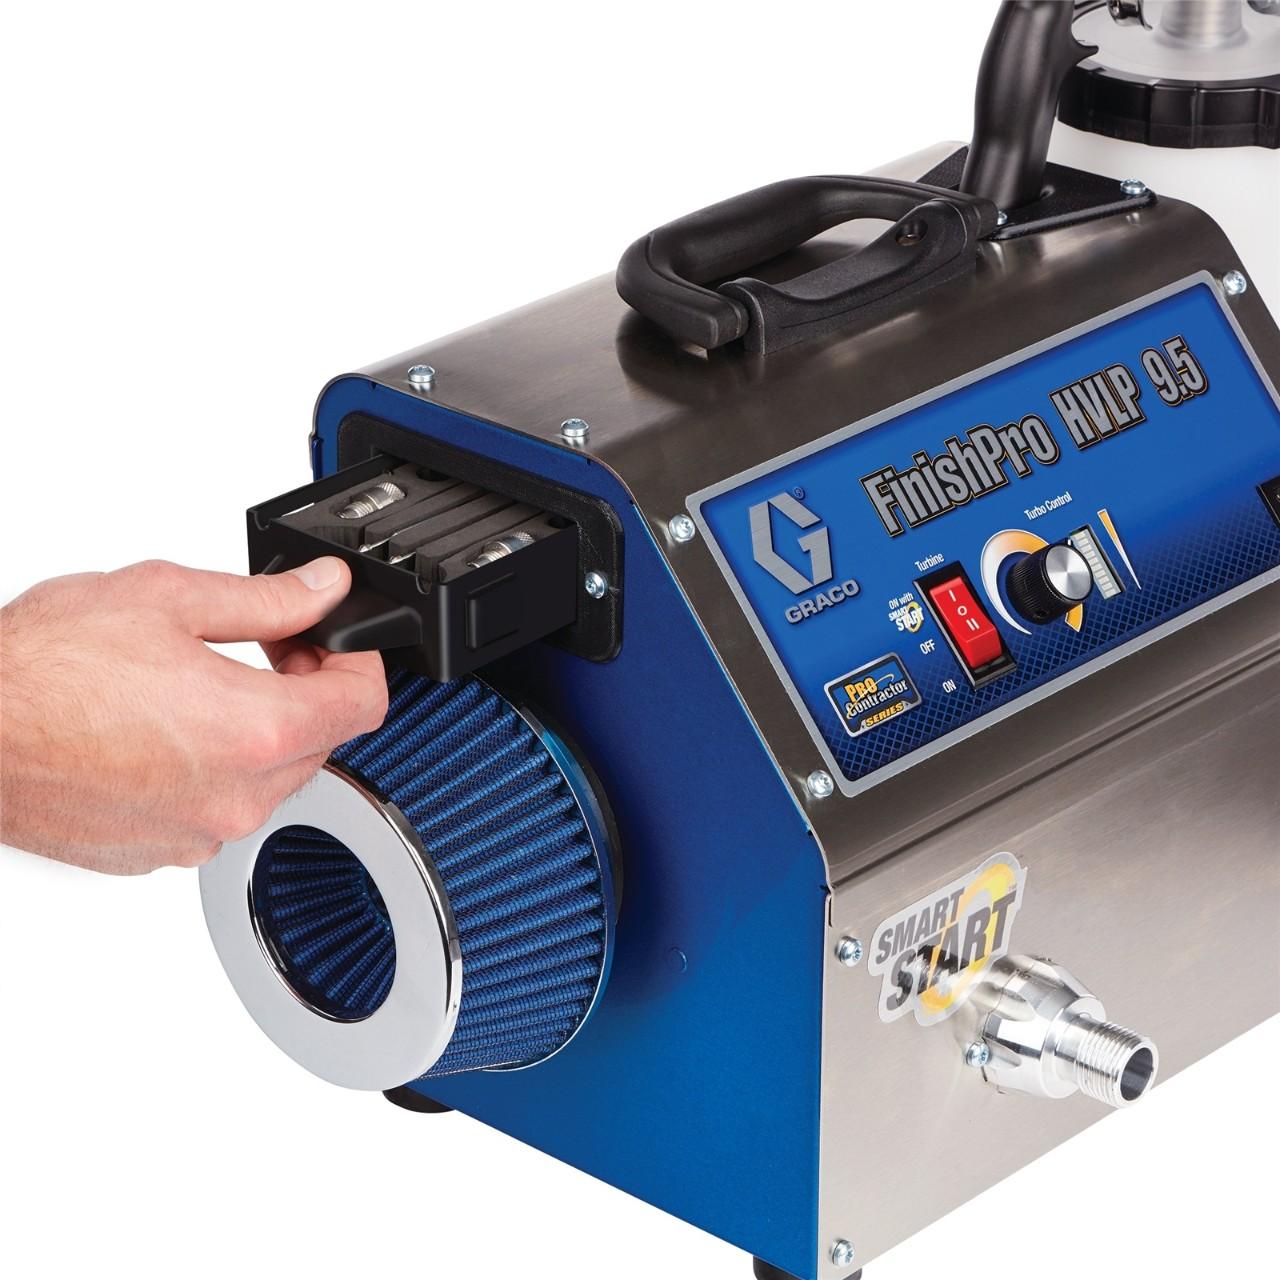 FinishPro HVLP - 9.5 ProContractor Series - Airless Sprayer - ProQuip